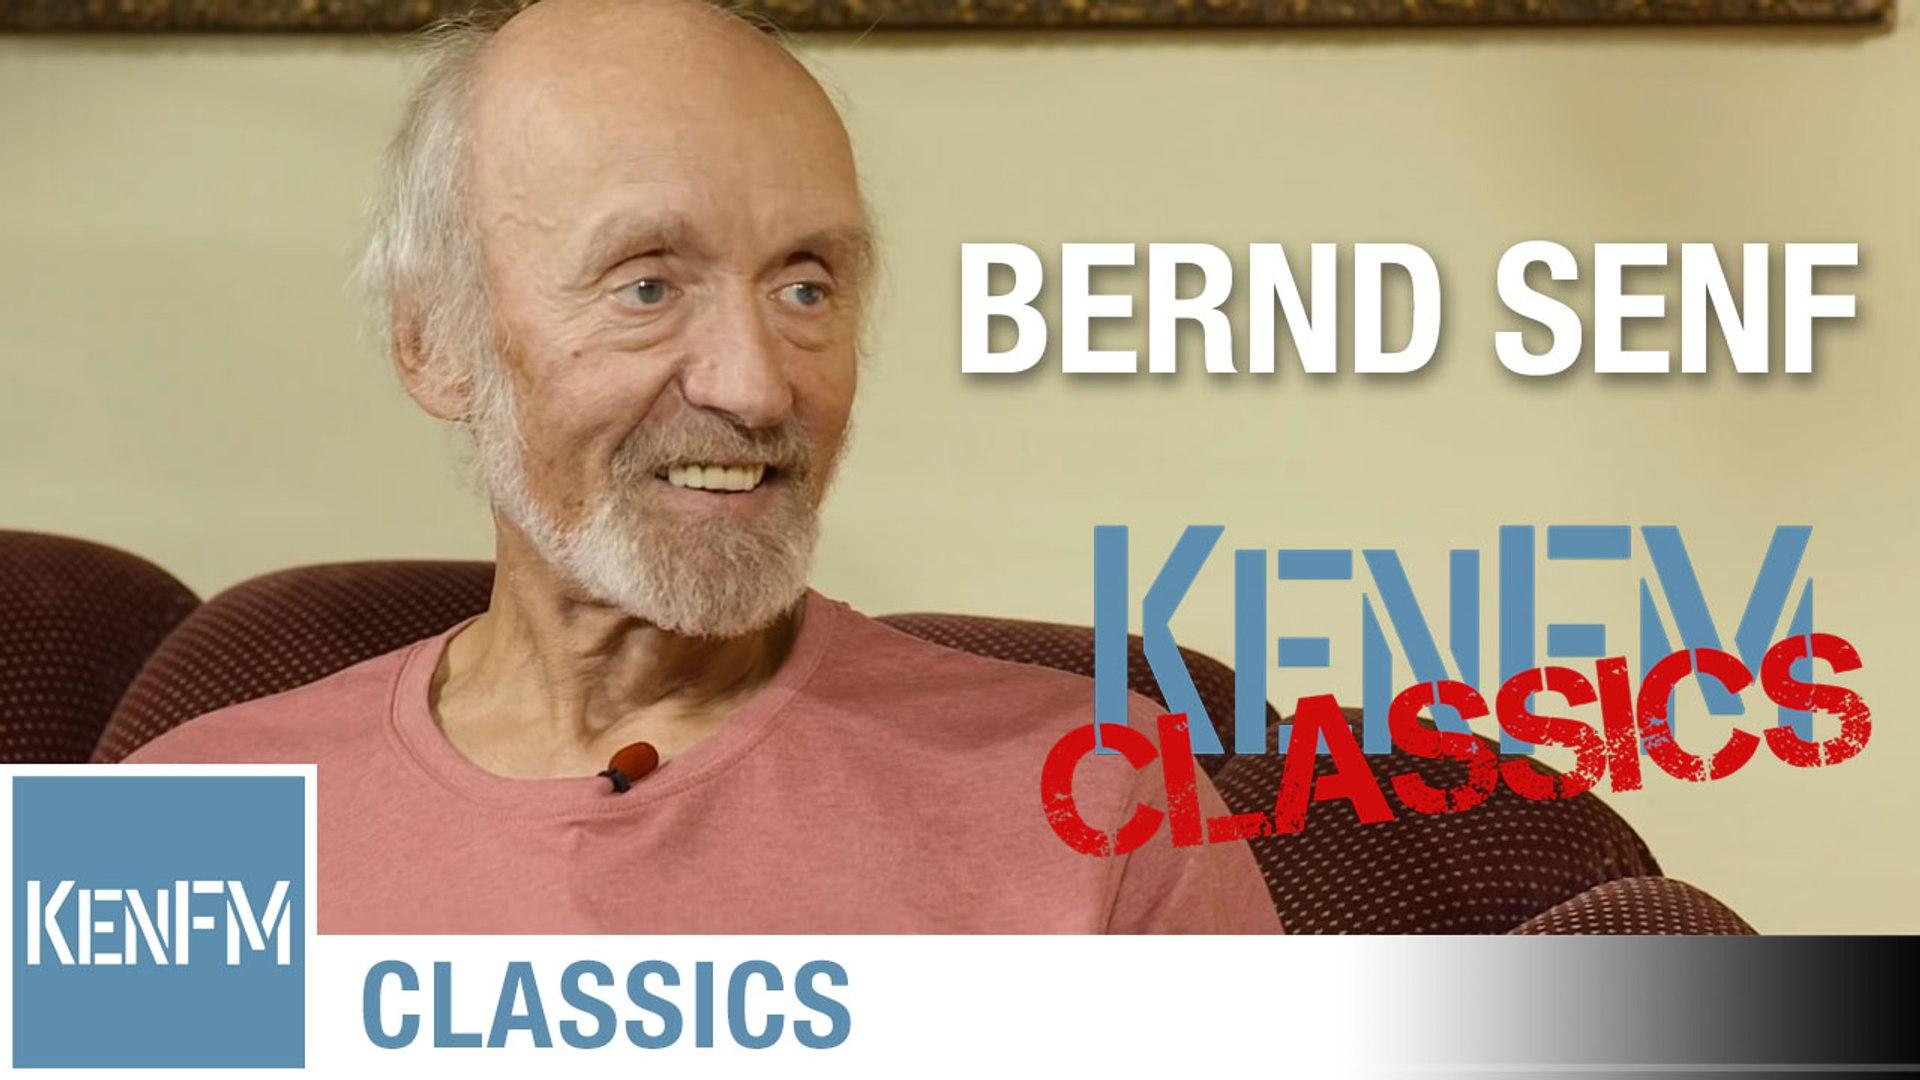 CLASSICS! KenFM im Gespräch mit: Bernd Senf